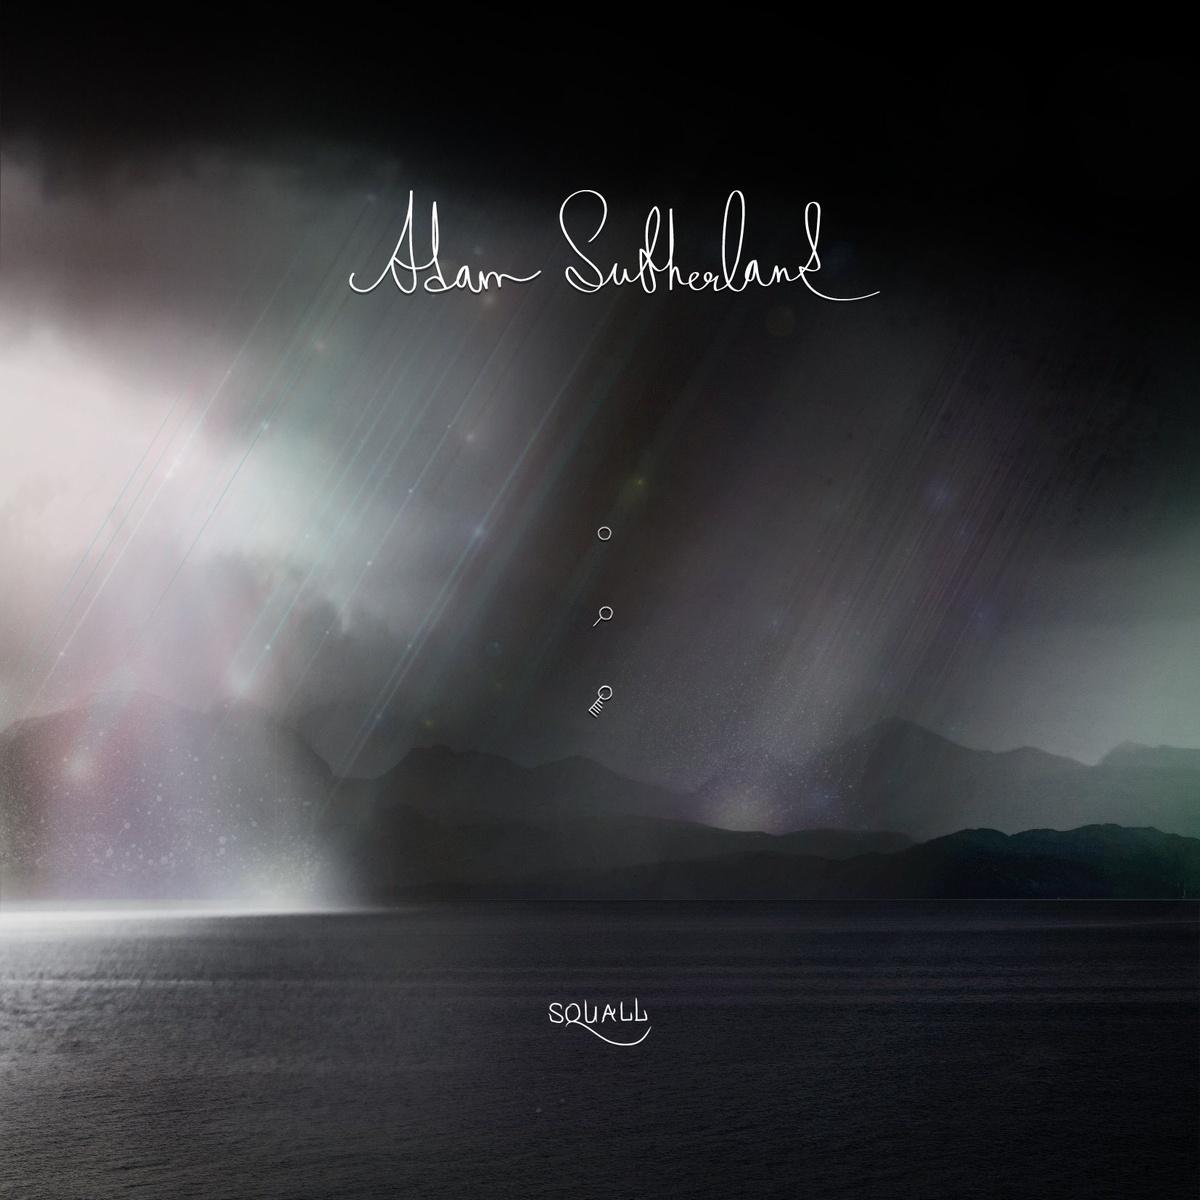 Adam Sutherland – Squall